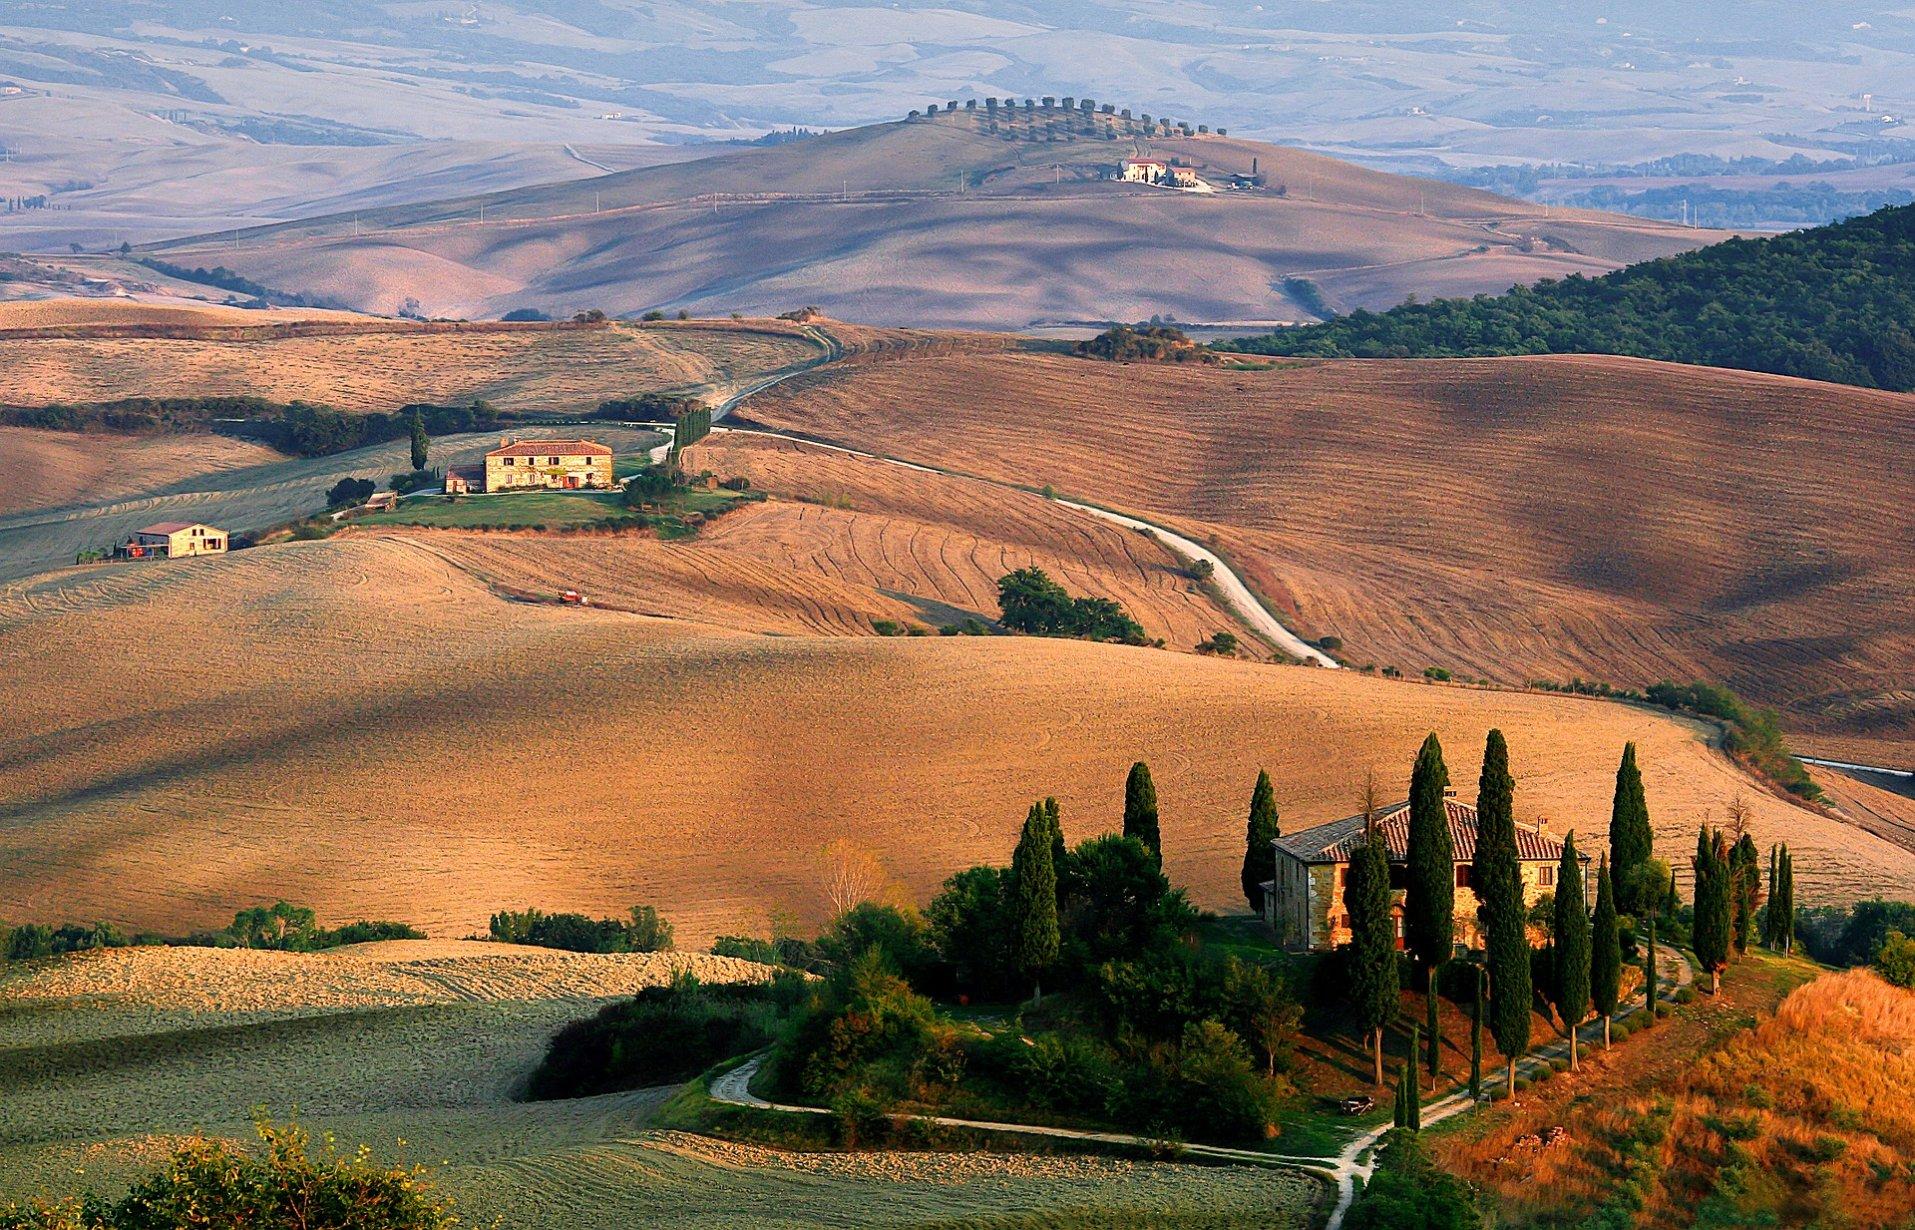 Italy Wine Tours » Top Wineries & Dine in Best Restaurants » CellarTours